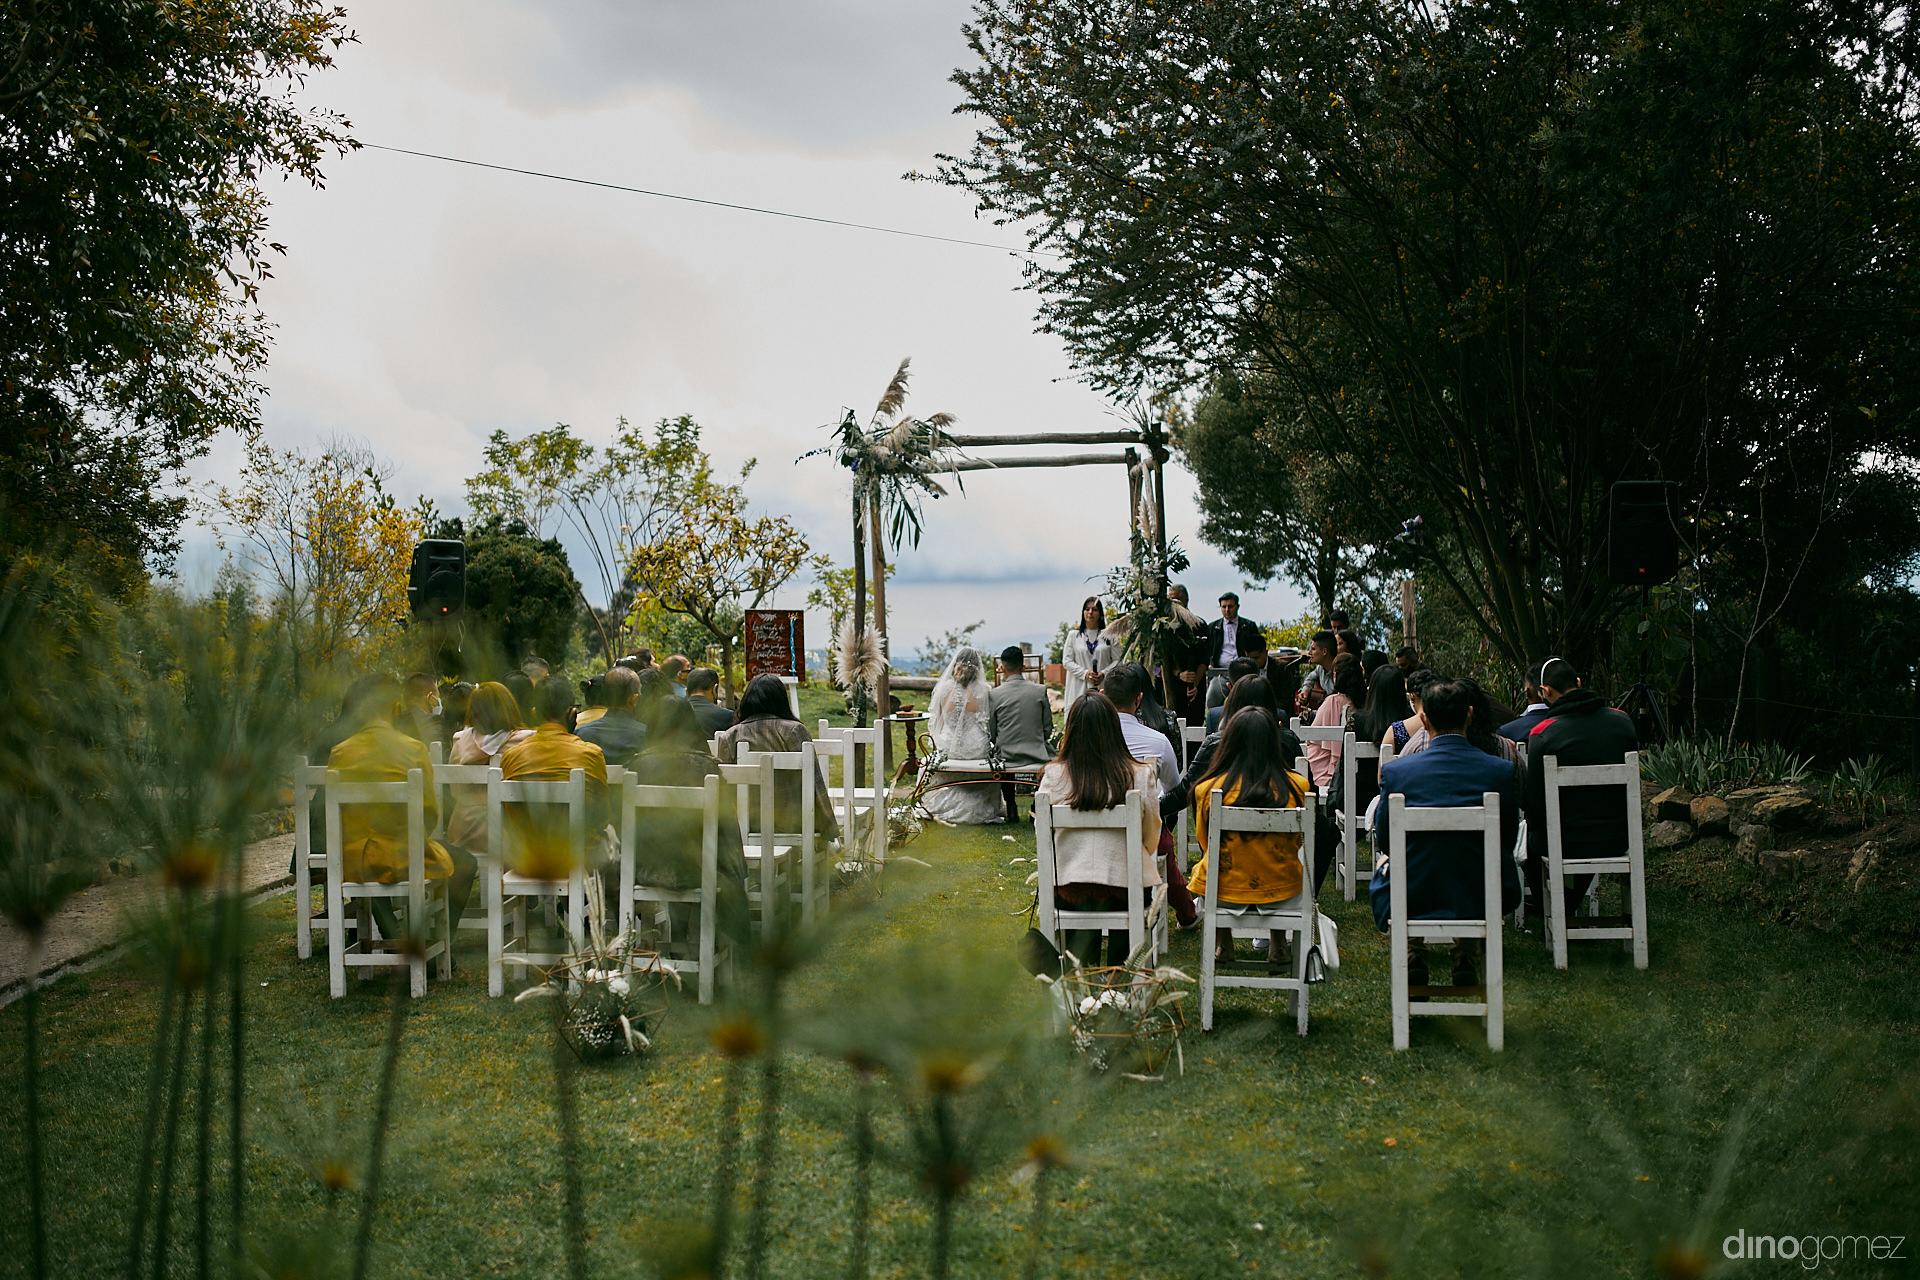 038 - Diy Budget Destination Weddings Can Be Prety Too!